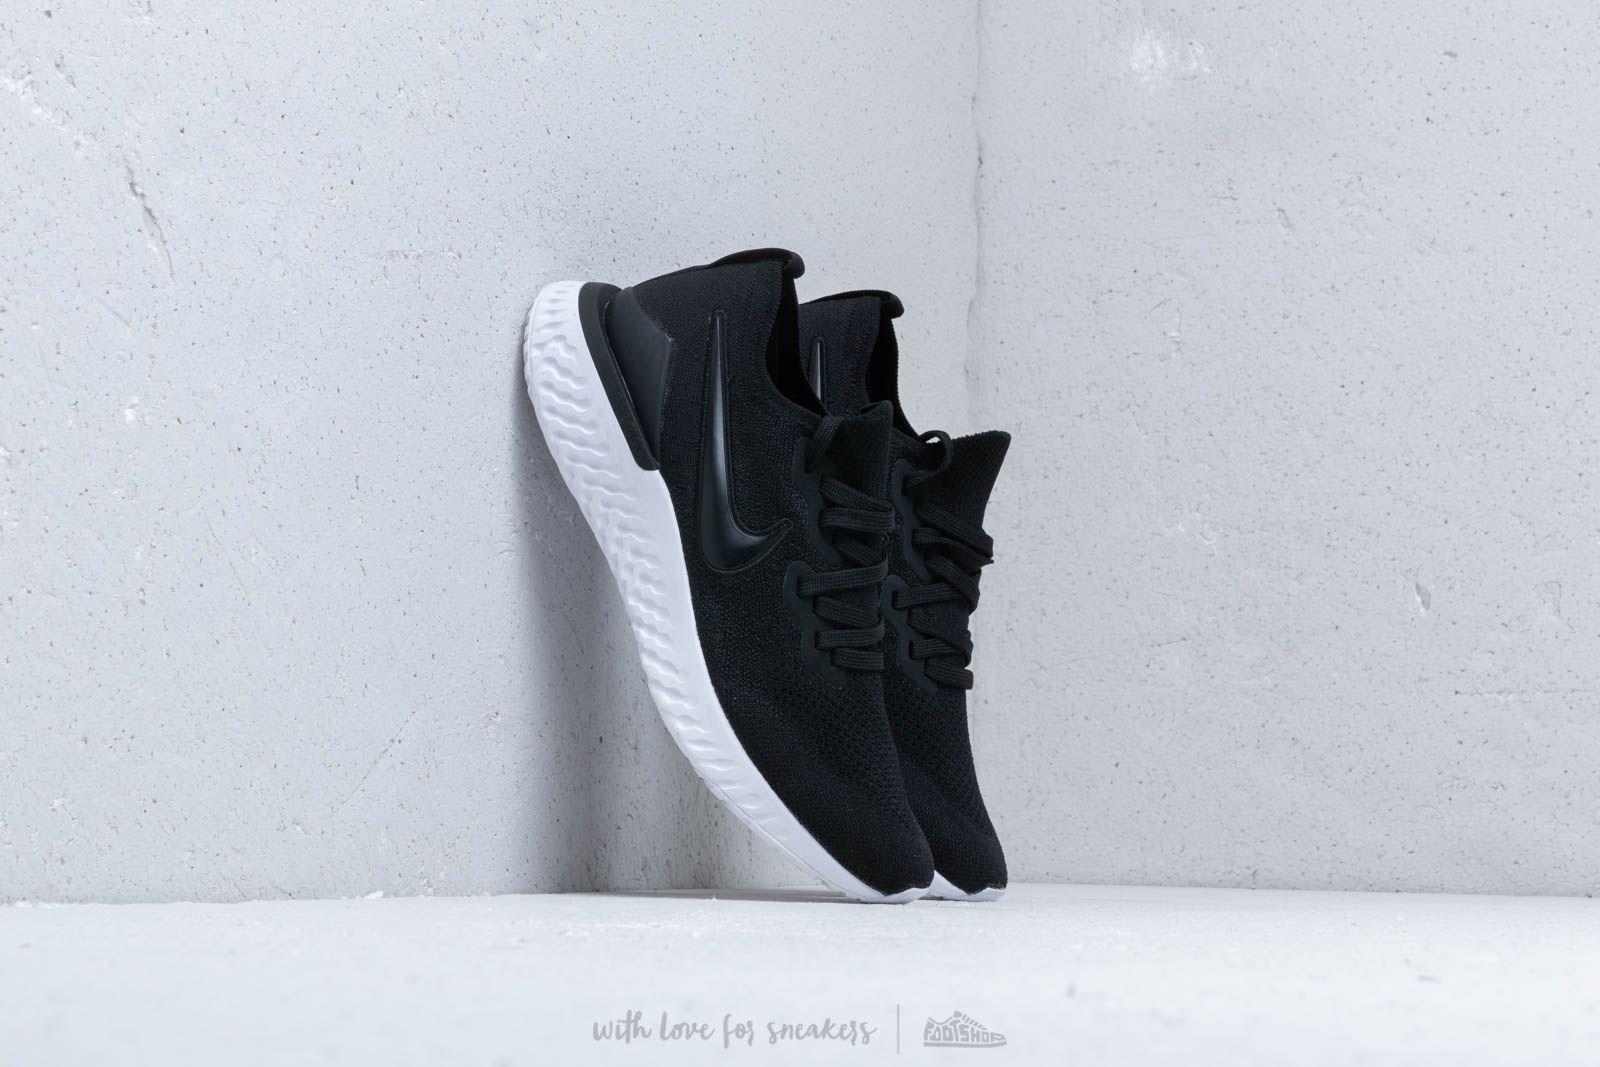 fda93d2aab6c9 Nike Epic React Flyknit 2 Black/ Black-Gunsmoke at a great price 139 €